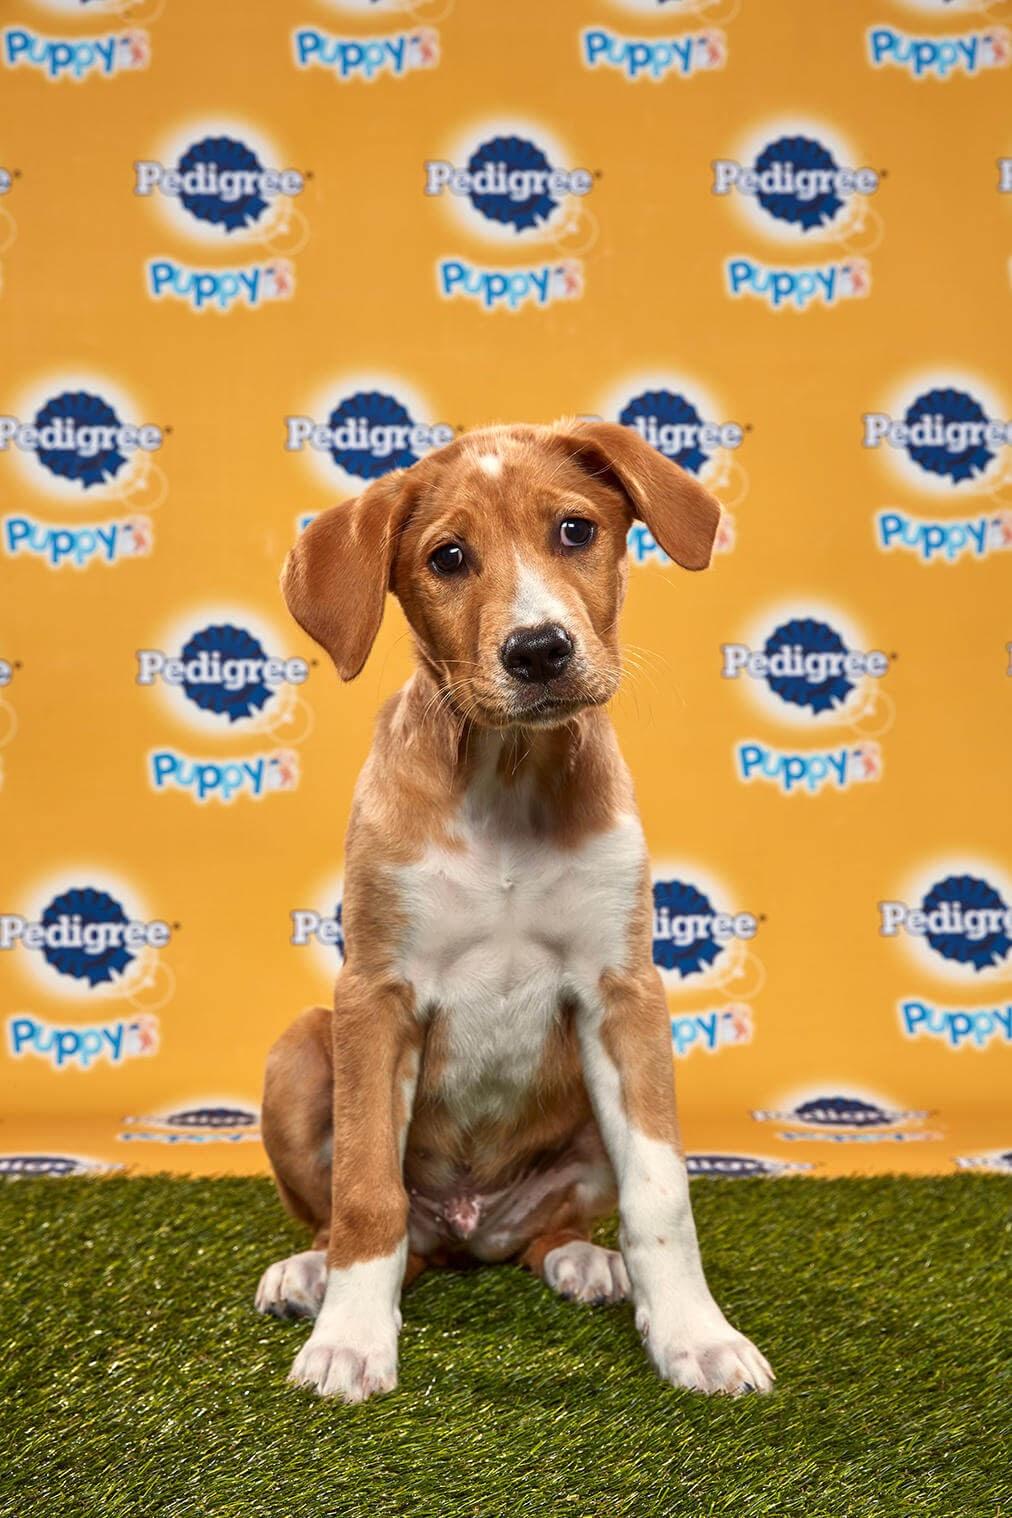 Kenny Dog - Animal Planet